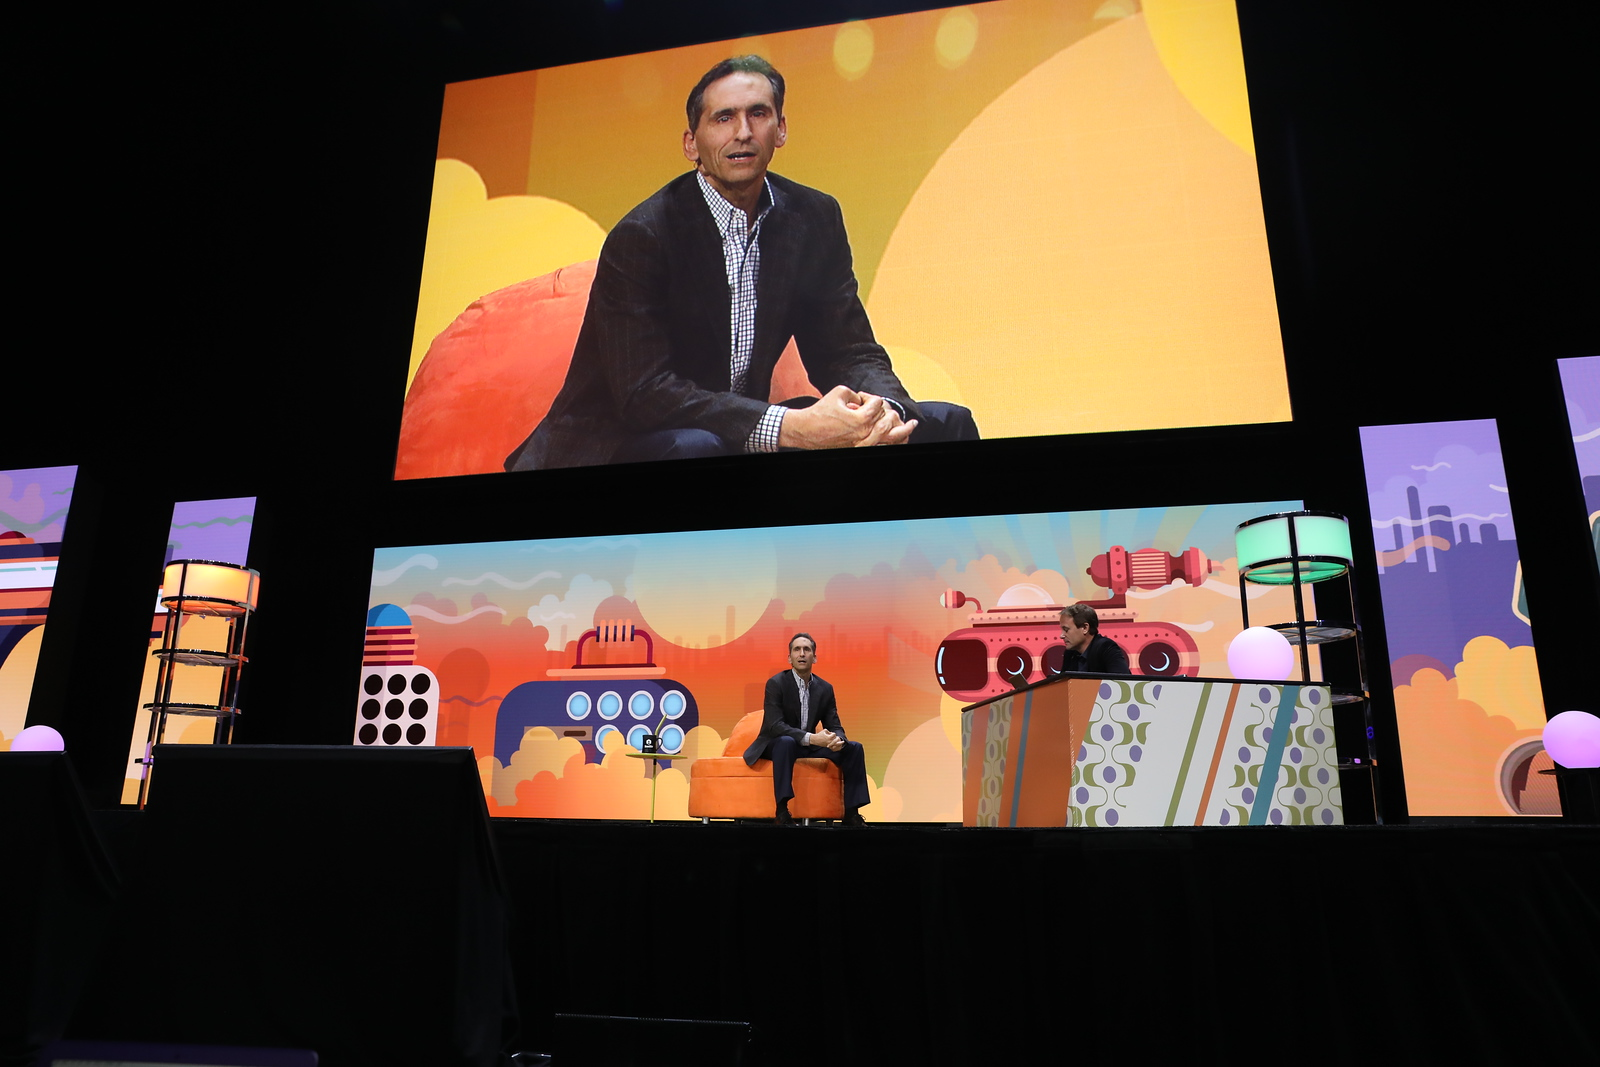 Veeva: The Biggest Vertical SaaS Success Story of All Time Peter Gassner FOUNDER & CEO / VEEVA SYSTEMS  Jason Lemkin FOUNDER / SAASTR